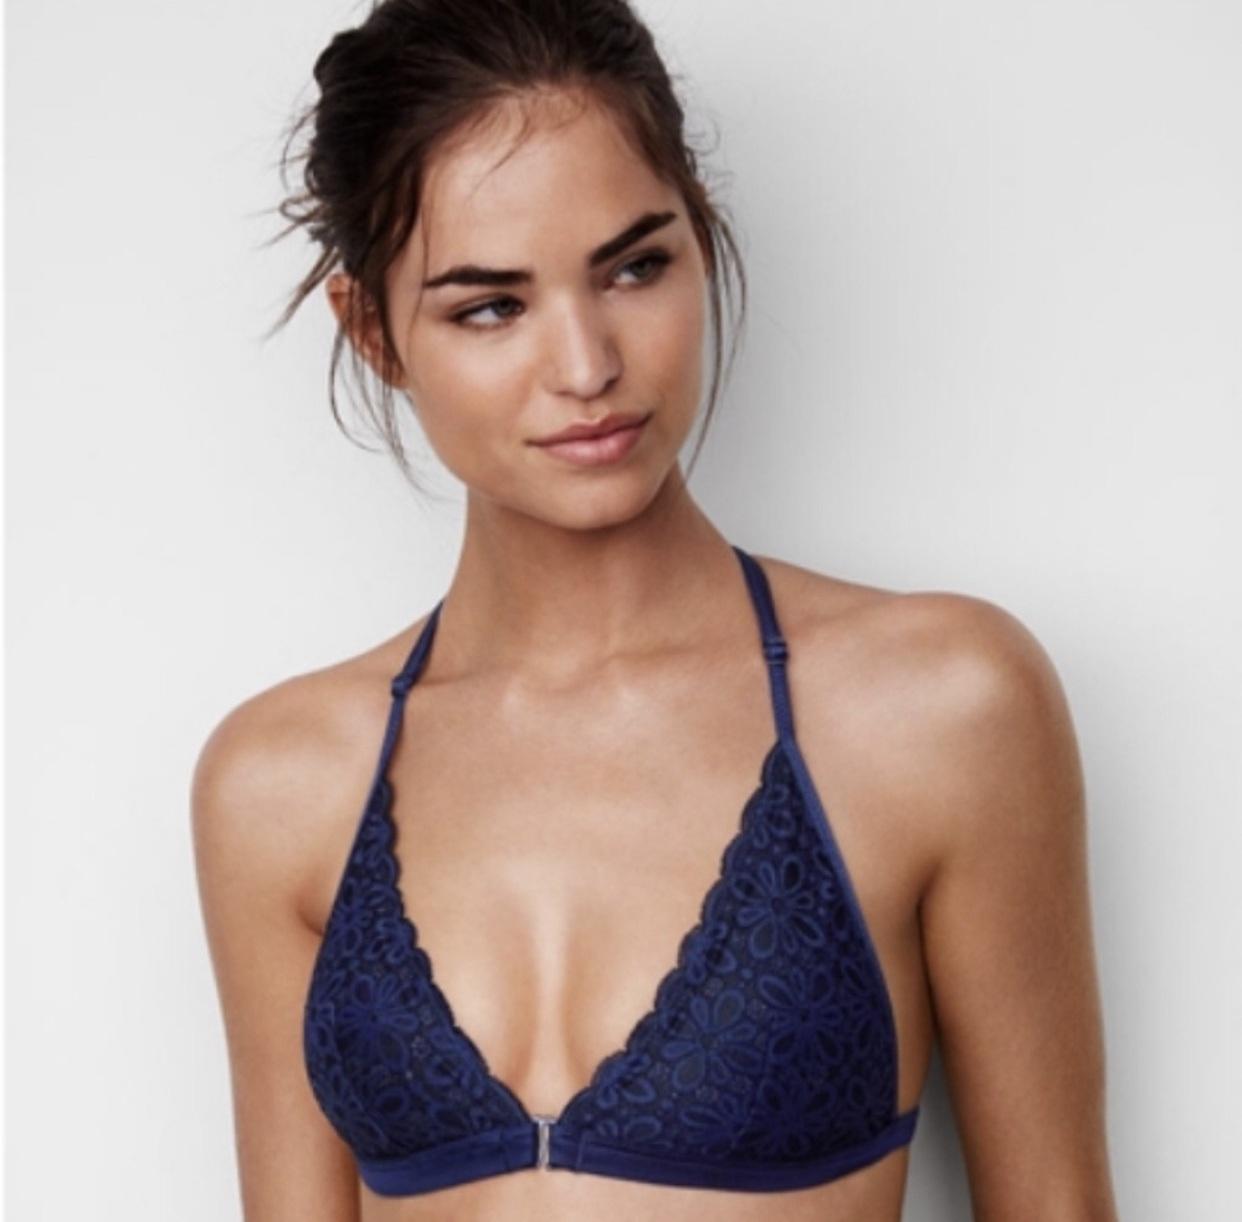 underwear laced navy bra victoria's secret bralette lace lace bralette